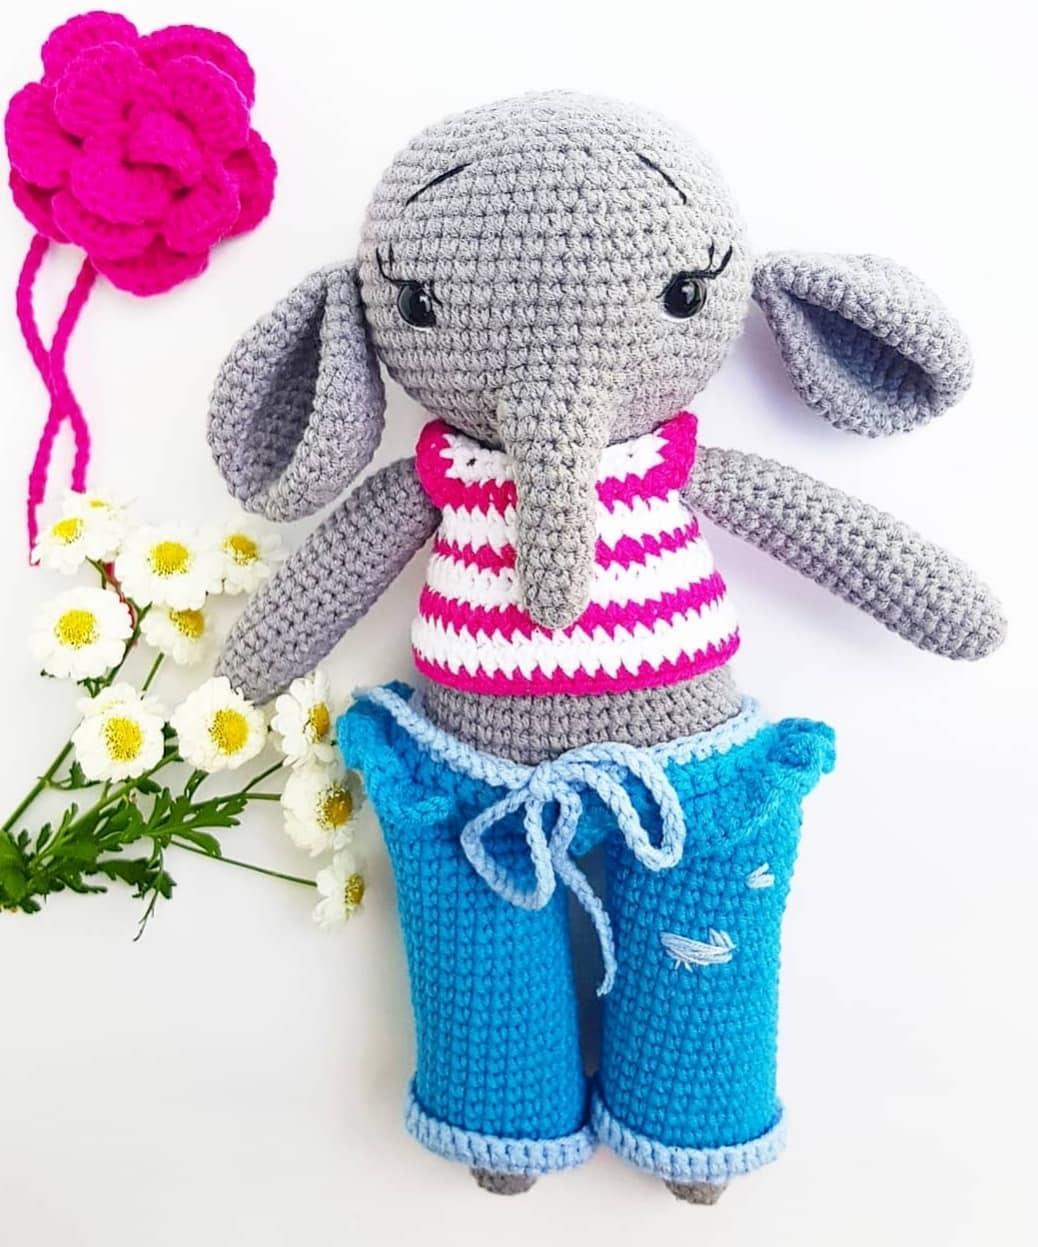 Amigurumi - Amigurumi Crochet Patterns